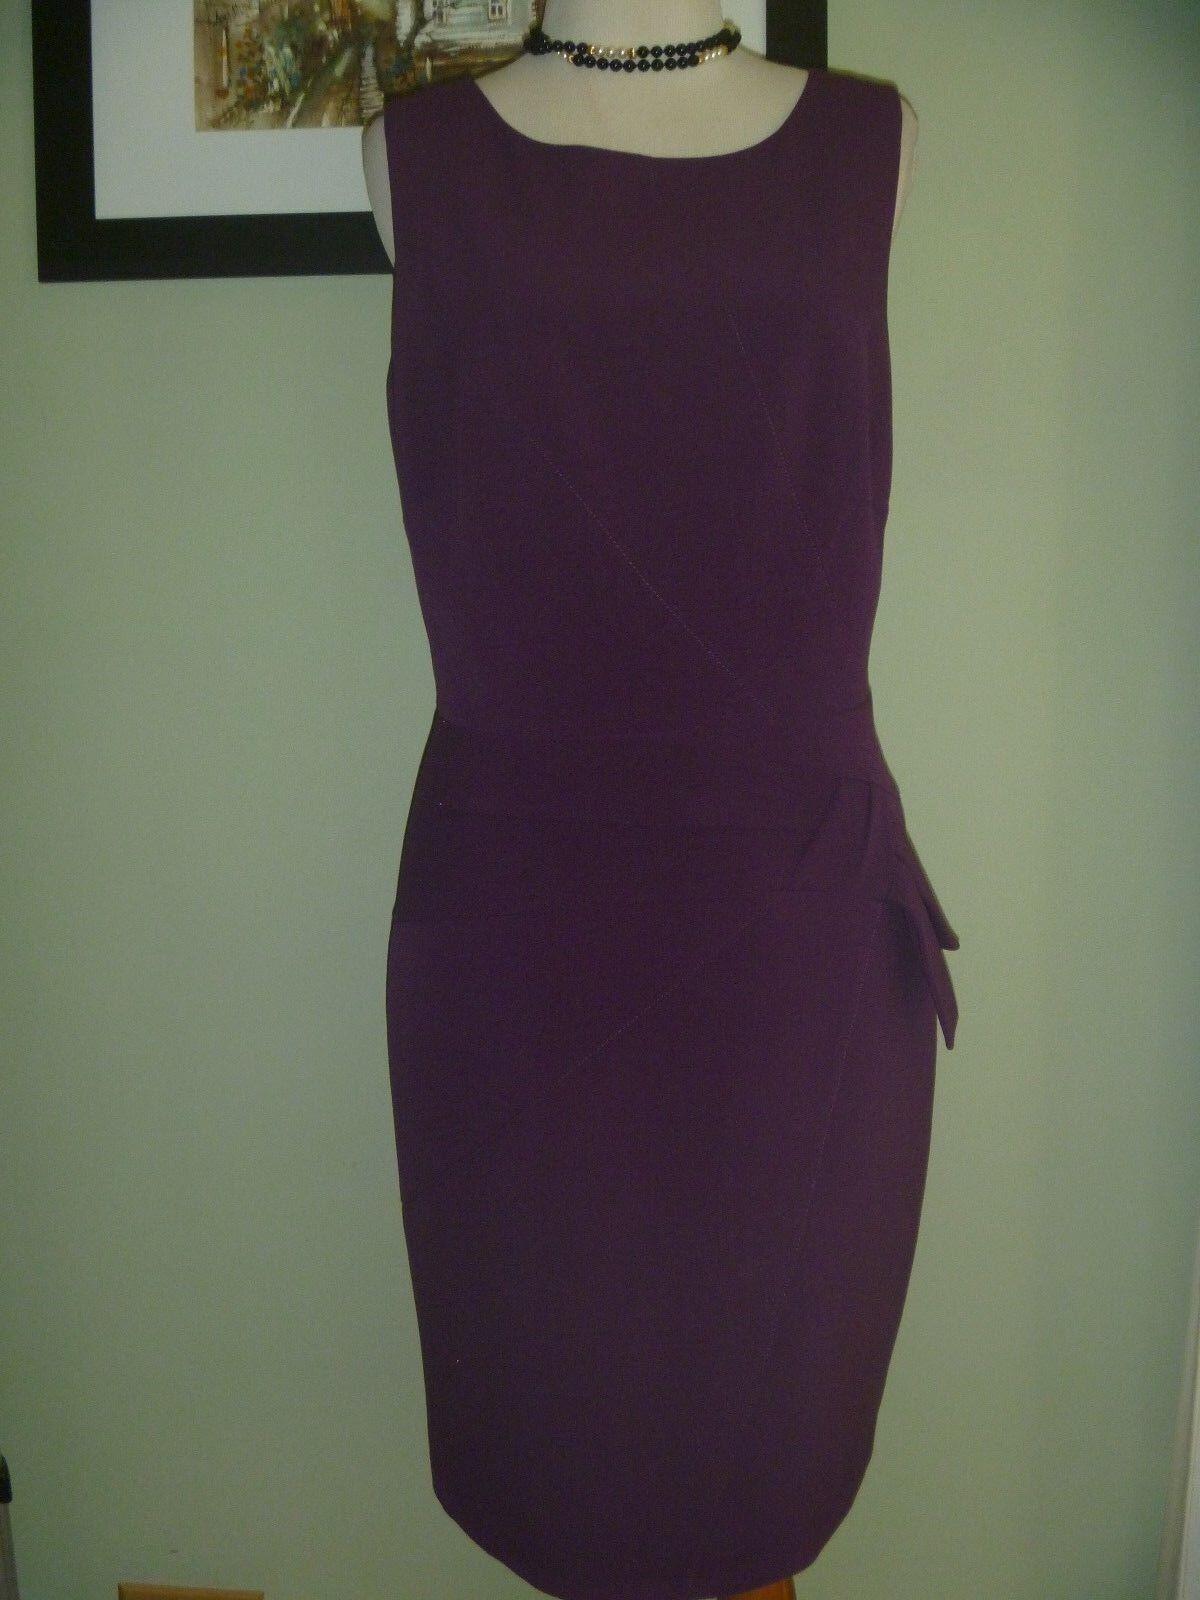 Laundry by Shelli Segal Los Angeles Purple Plum Dress Size 8